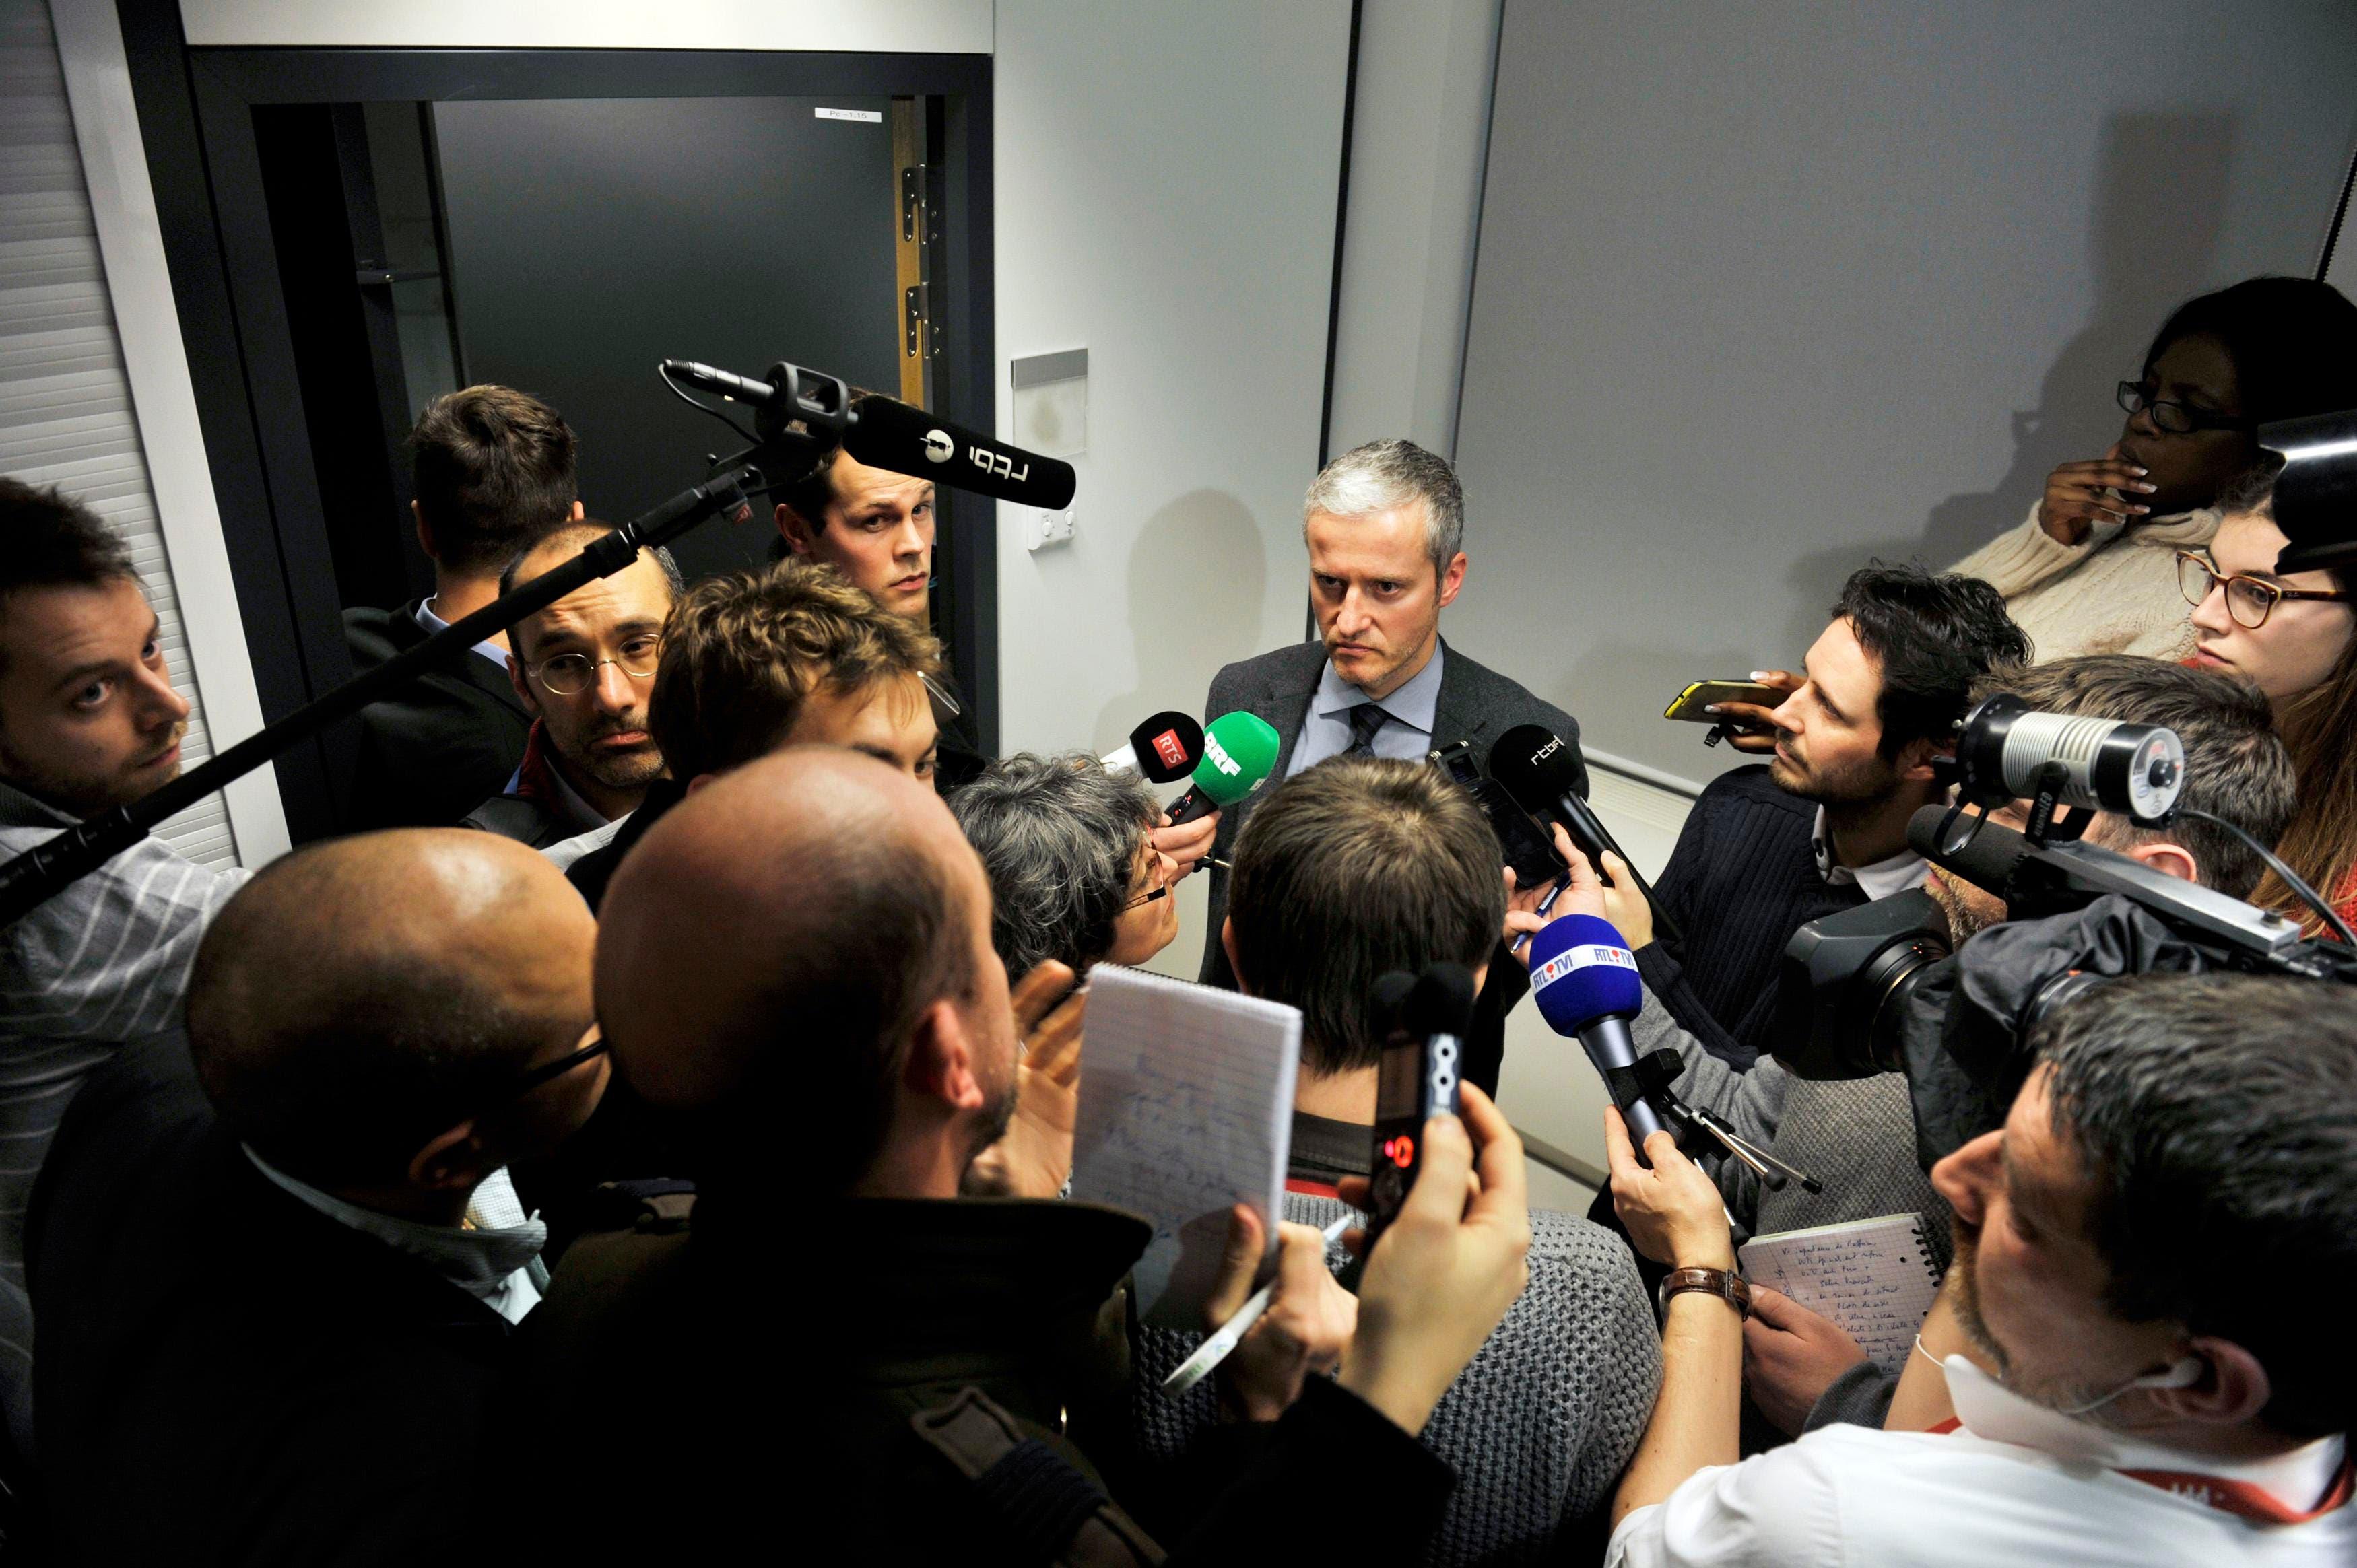 Belgian prosecutors' spokesman Thierry Werts talks to reporters in Brussels January 15, 2015, REUTERS